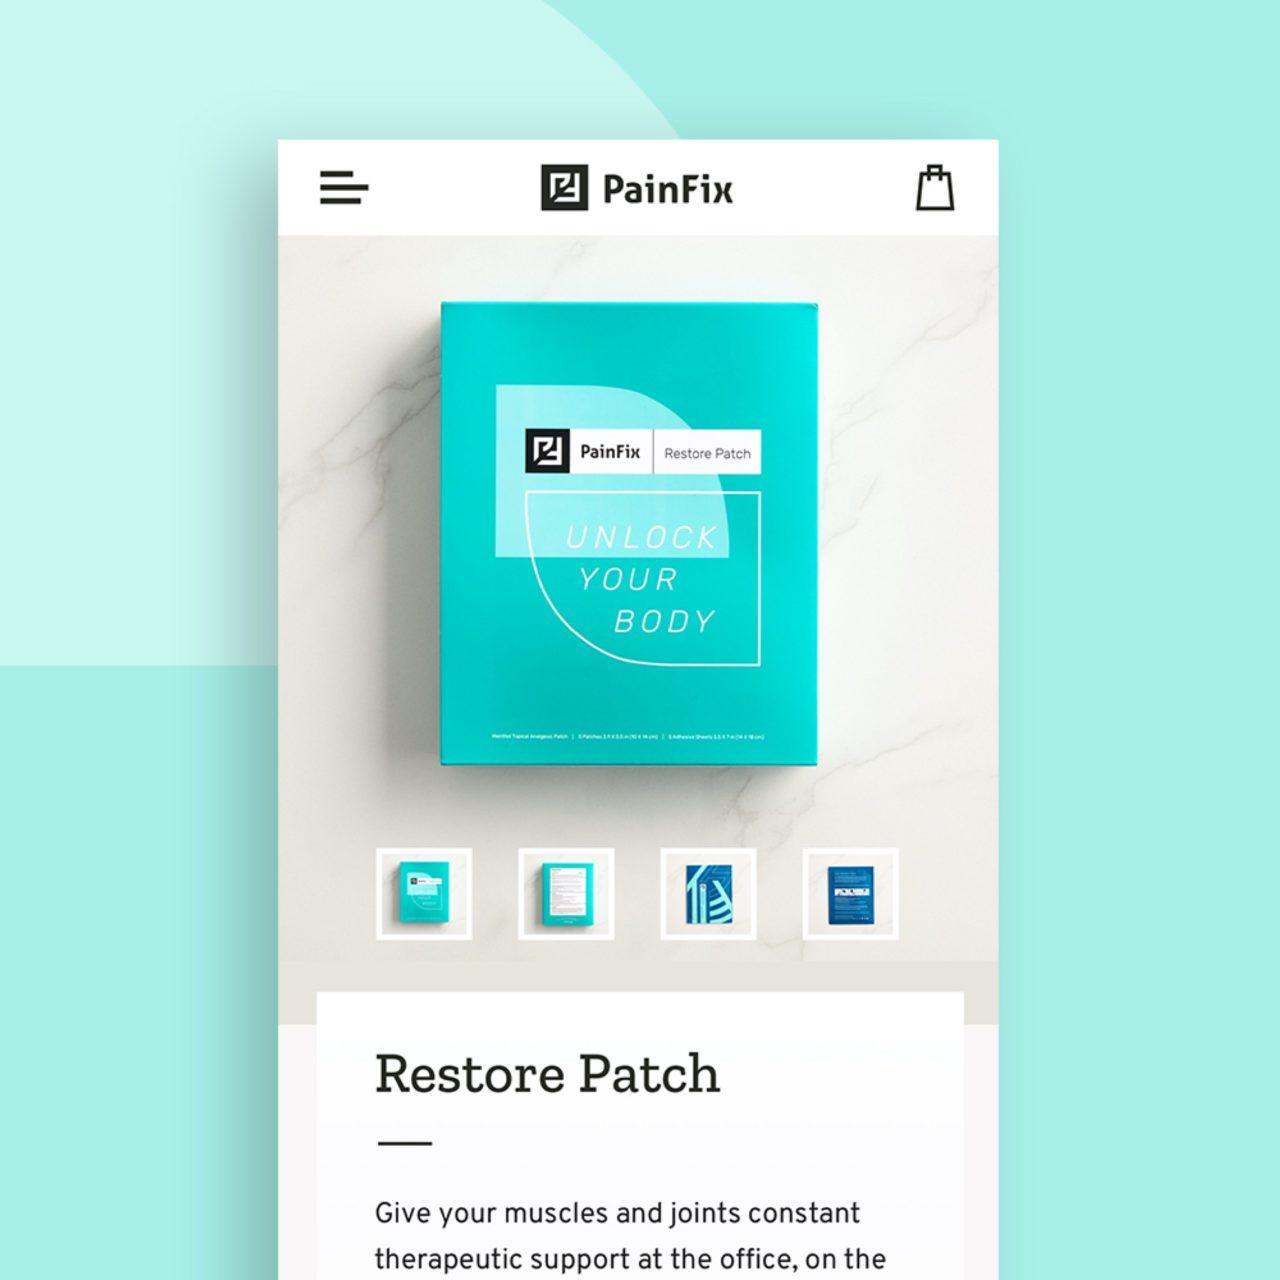 Painfix website